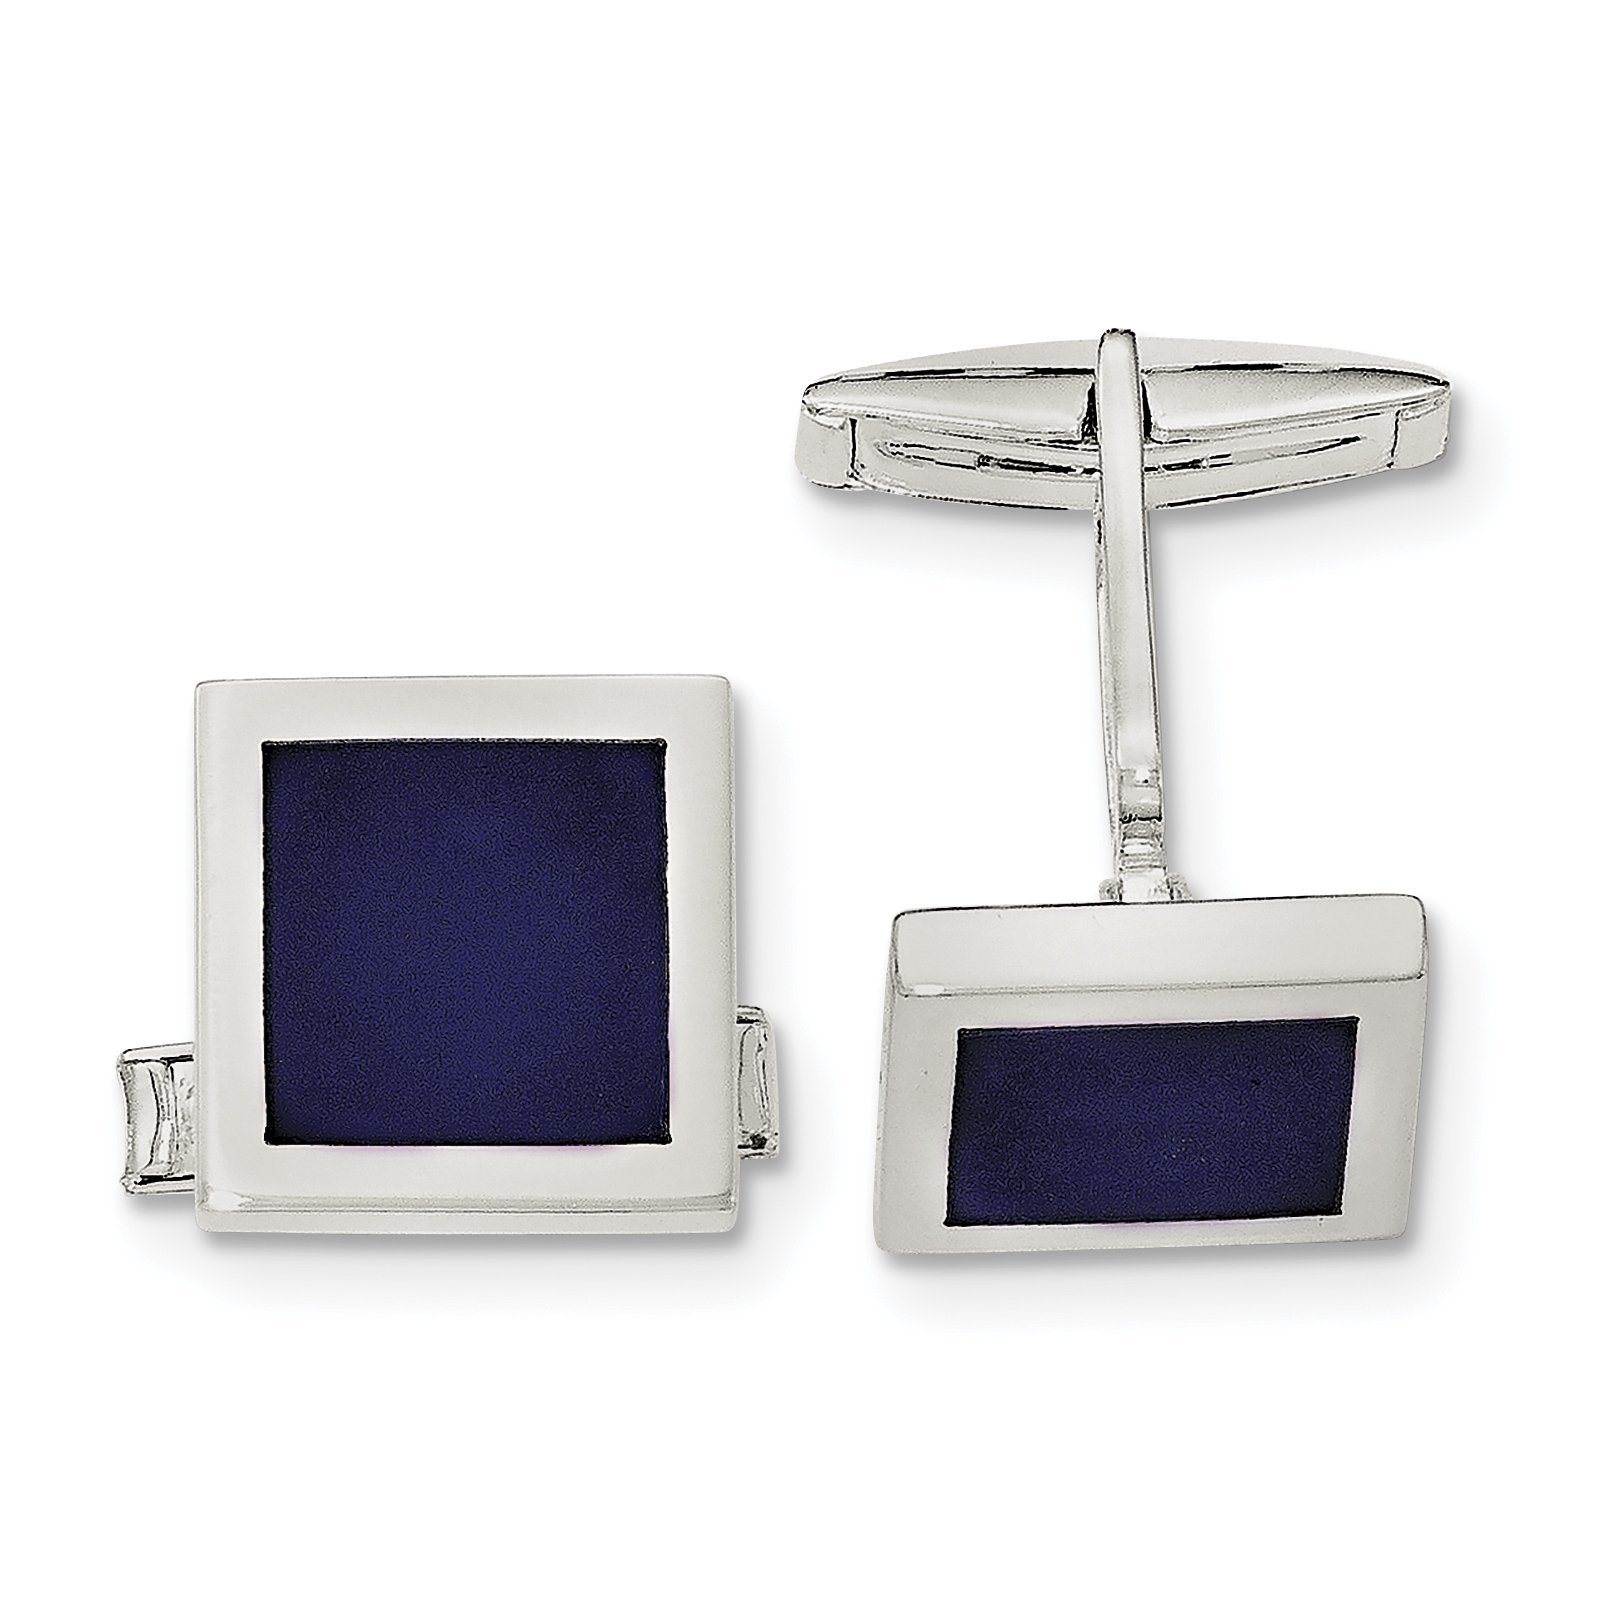 Carpe Diem Latin Gold-tone Cufflinks Crystal Tie Clip Gift Set